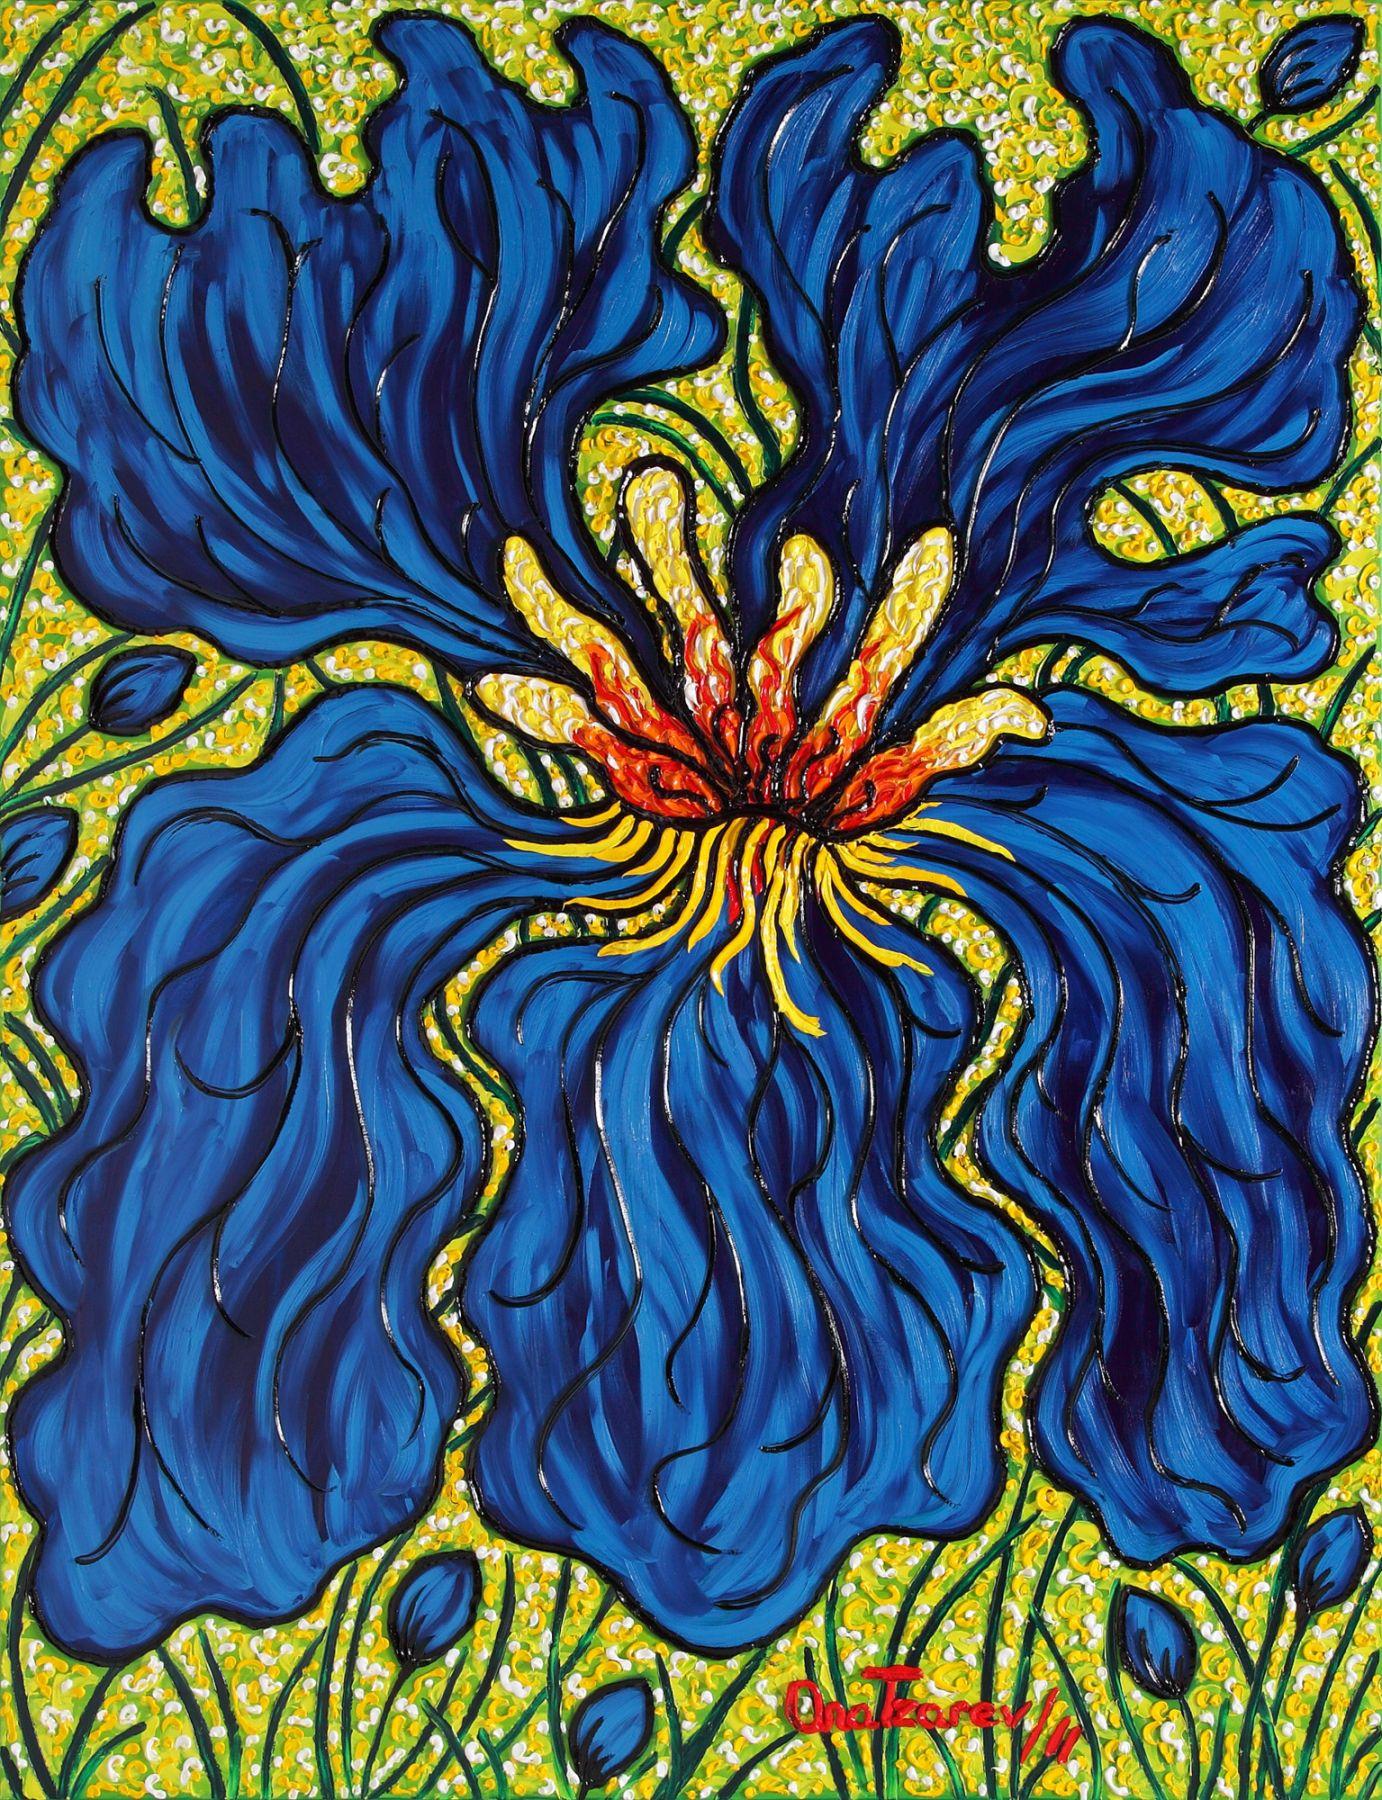 Infatuation (Iris) (Garden-La Fleur du Cap), 2011 - 4194